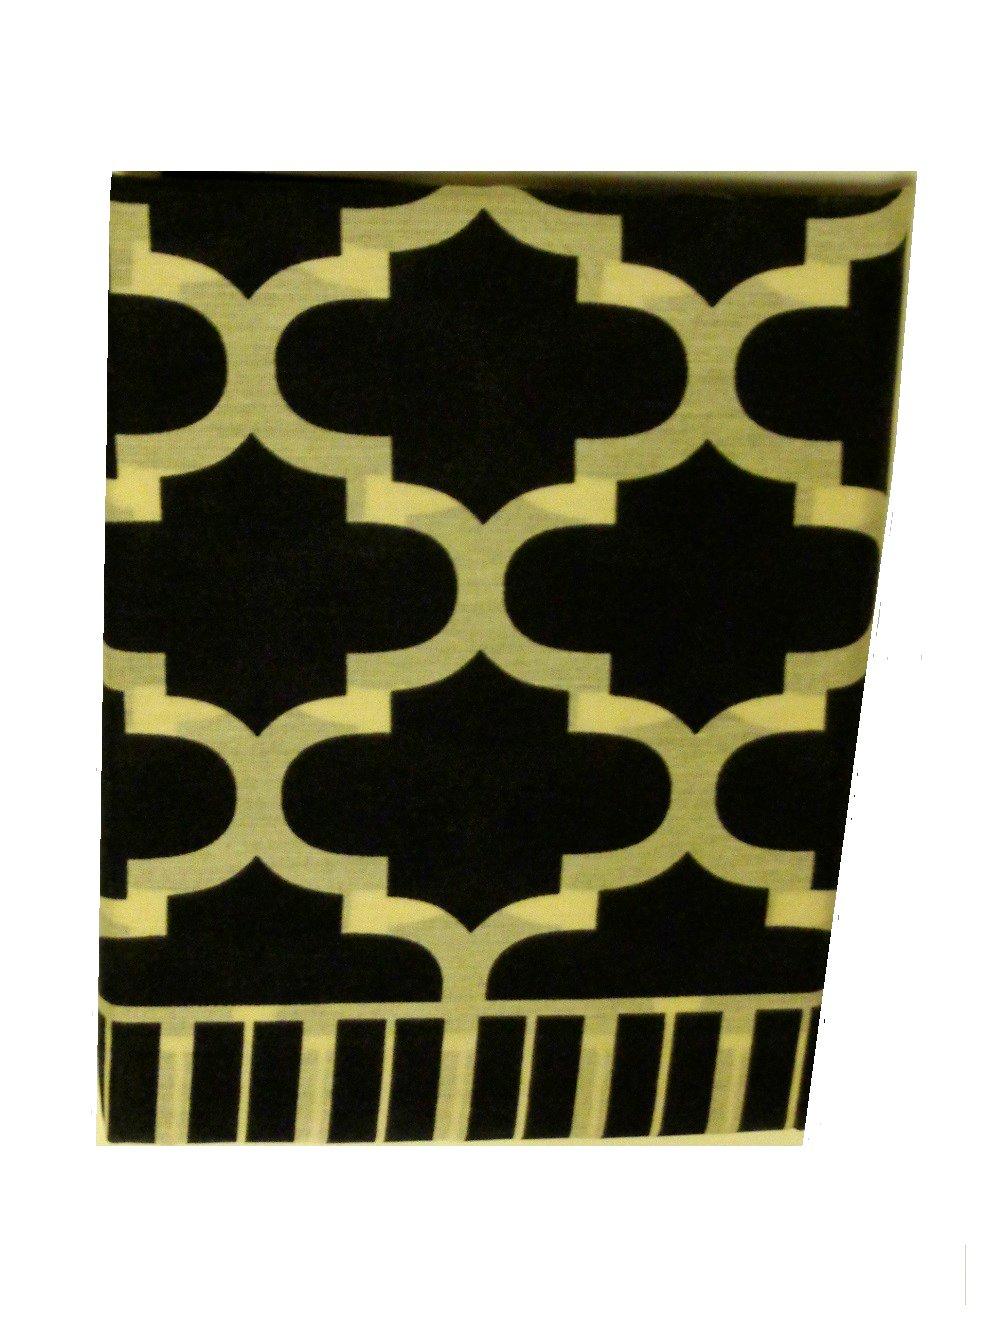 Black Ivory Fretwork Gemetric Window Treatment Set Valance Tiers